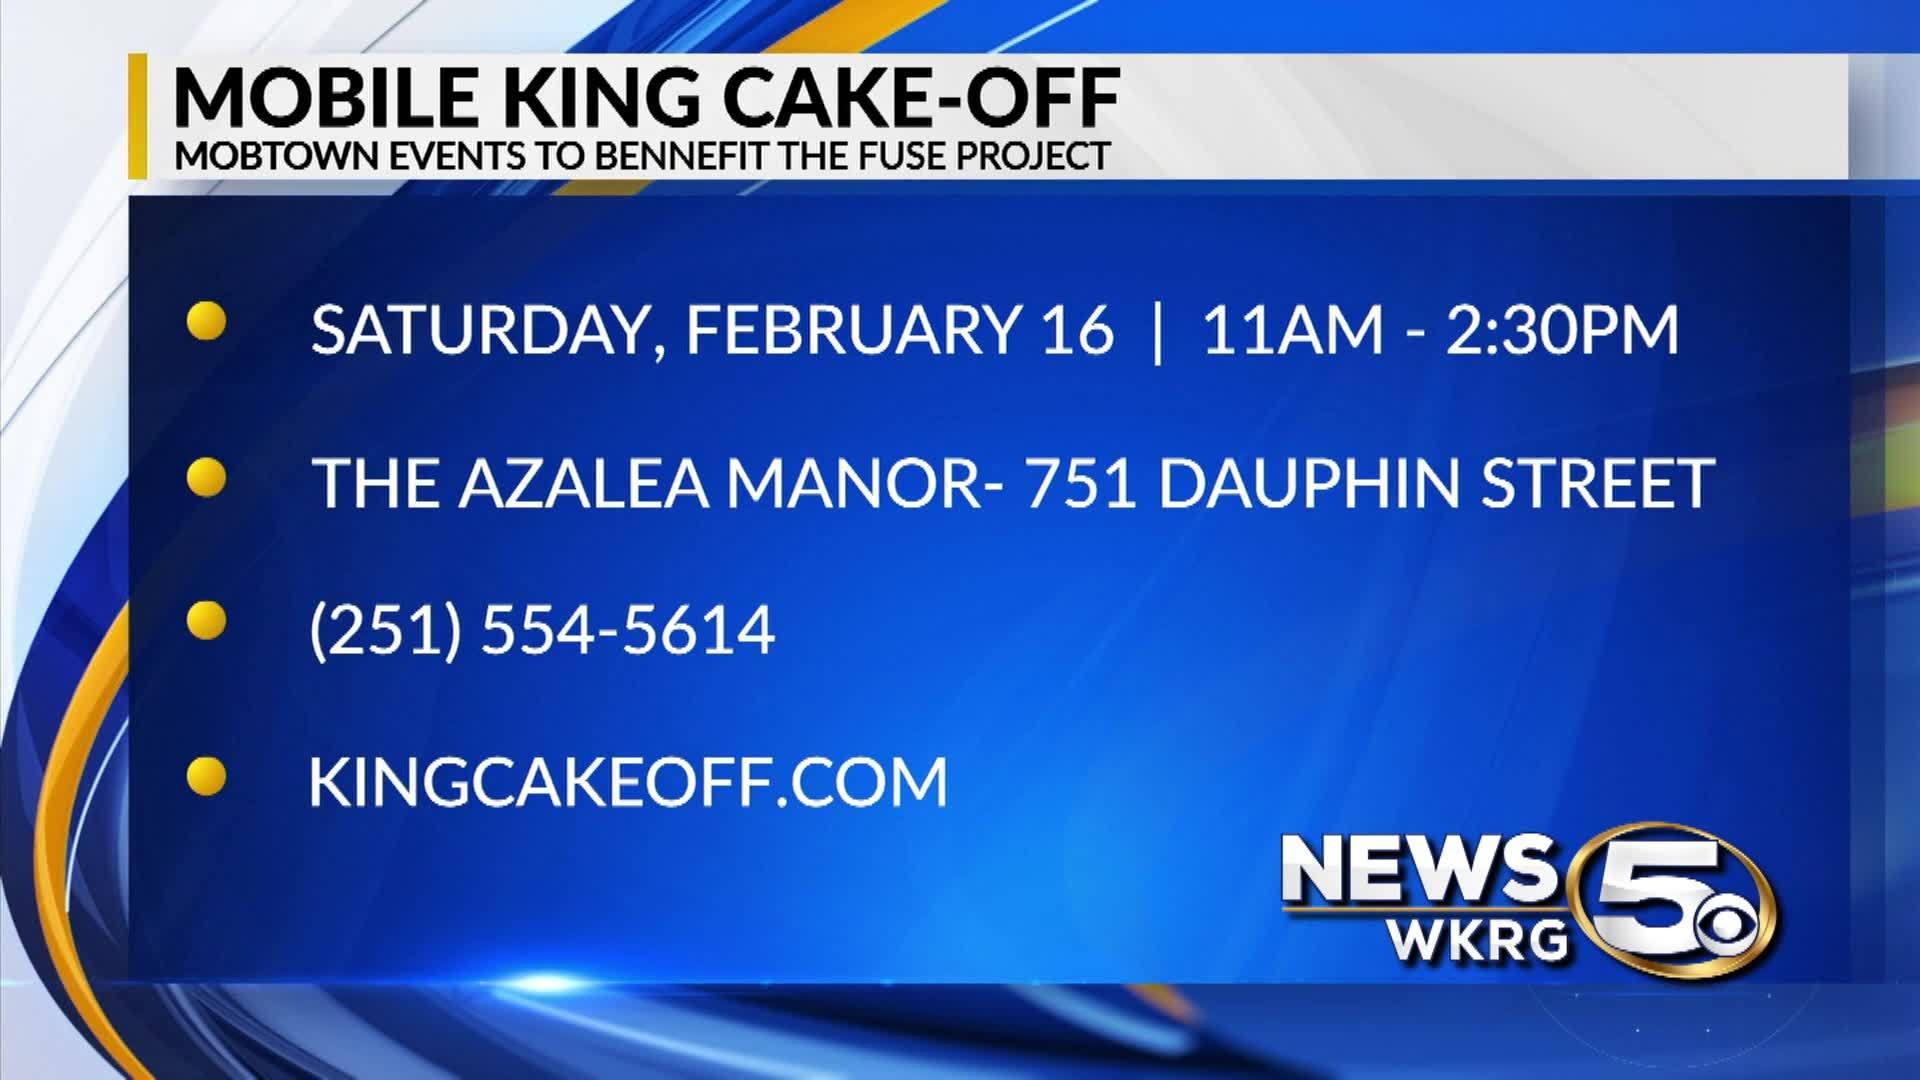 Mobile King Cake-Off